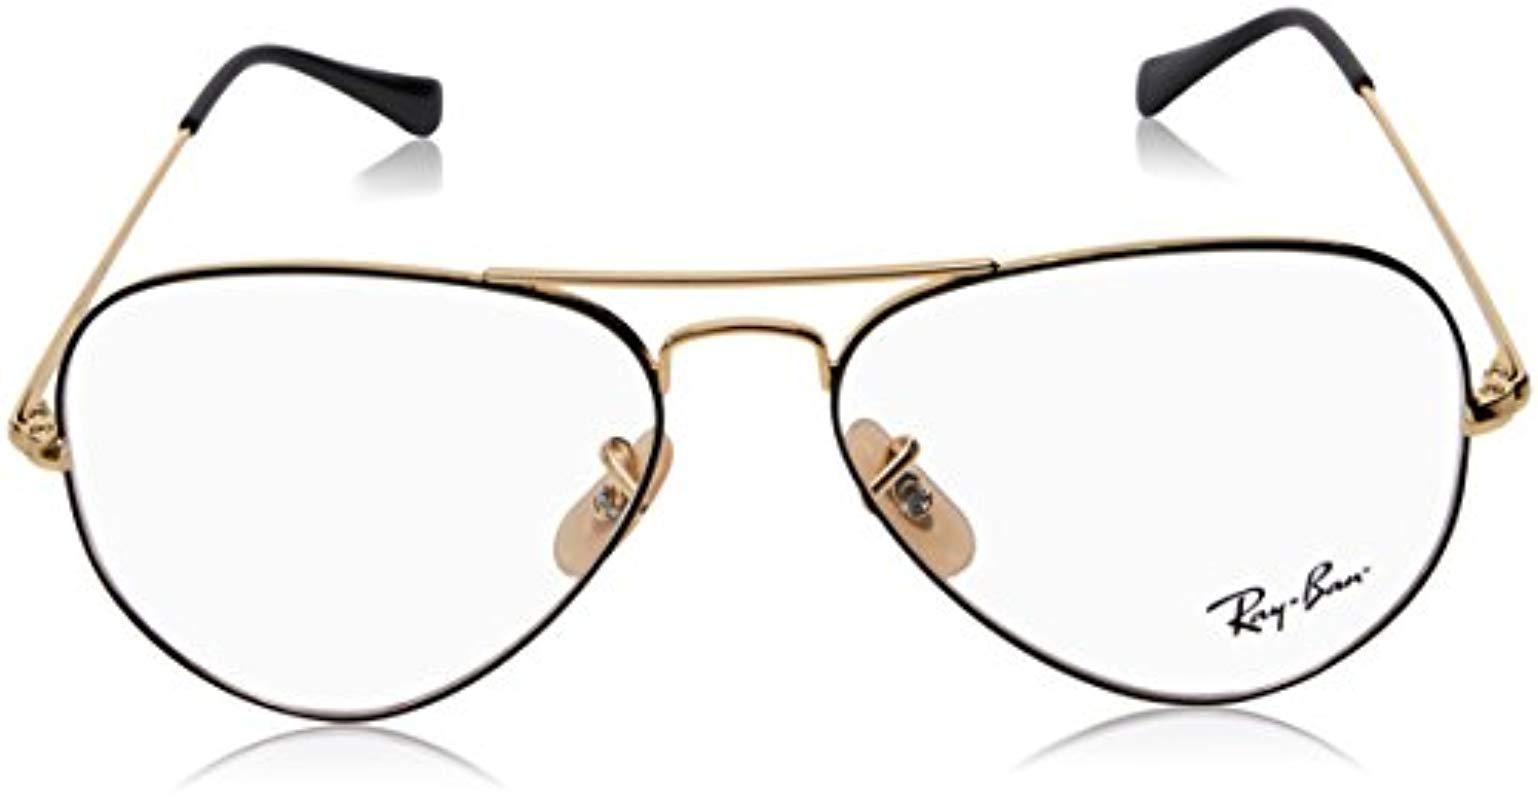 24554239992cb Ray-Ban - Metallic Rx6489 2945 58 Aviator Glasses In Silver Rx6489 2945 58  -. View fullscreen